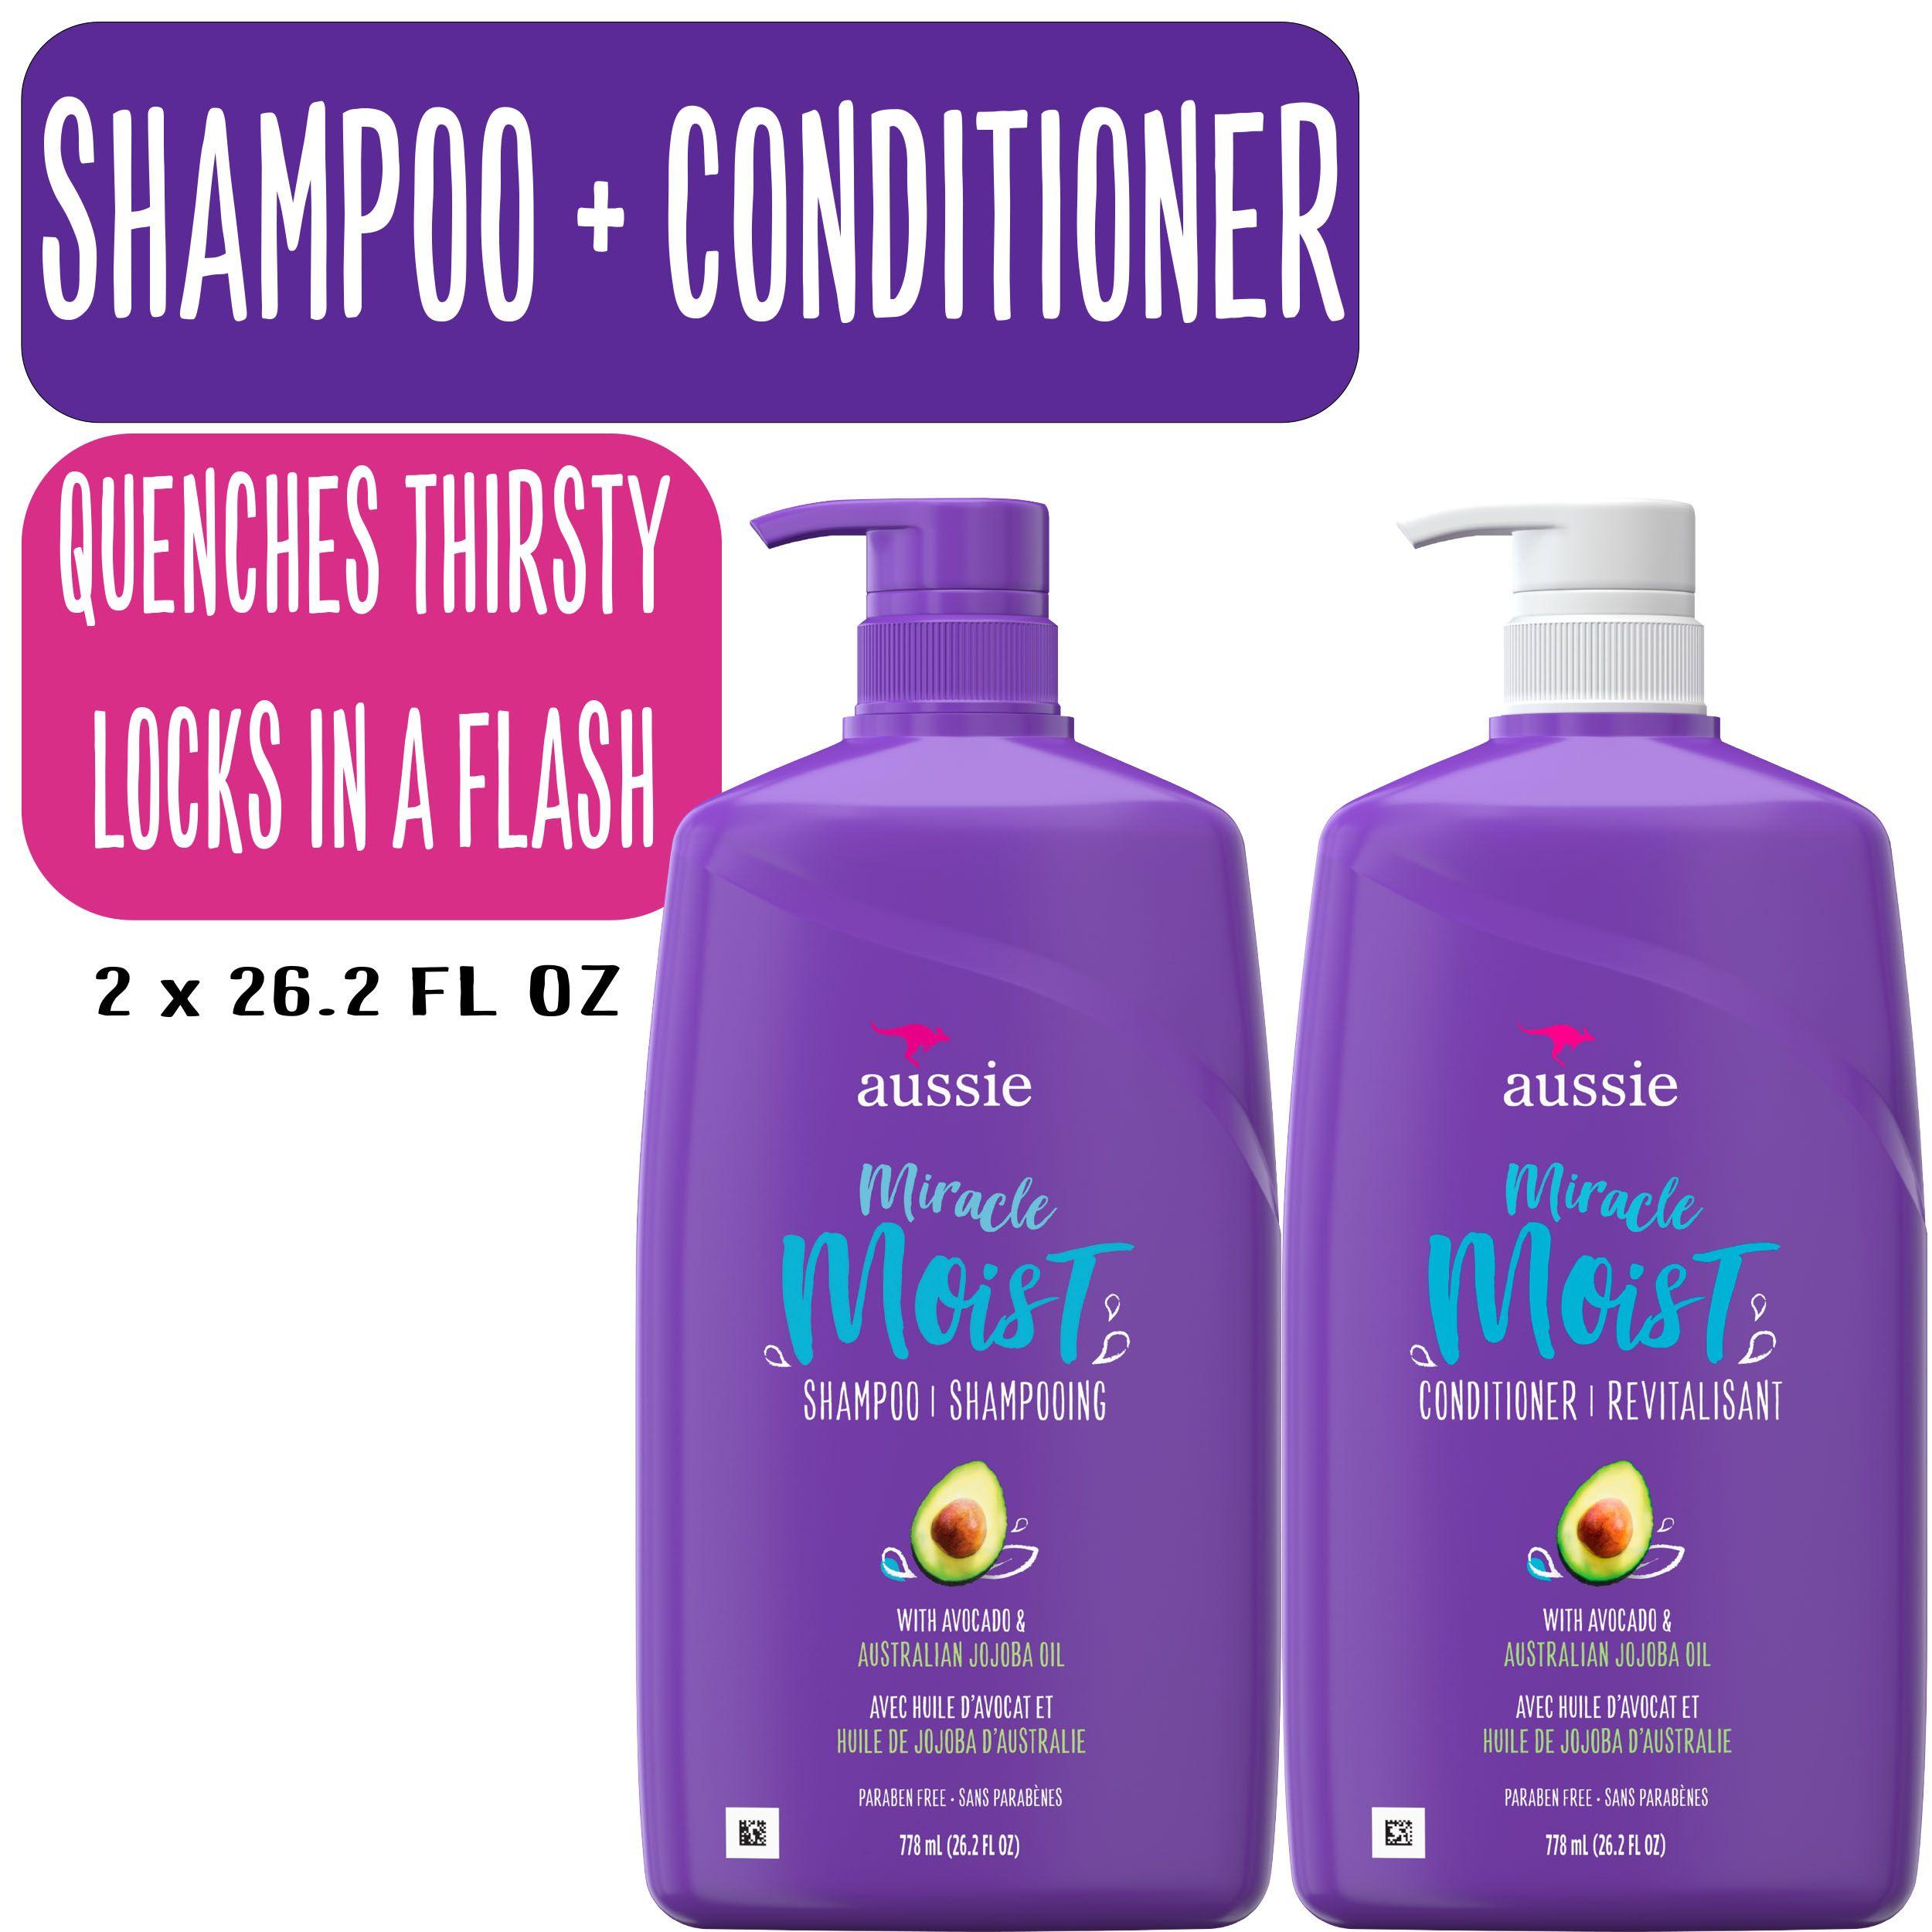 Aussie Miracle Moist Shampoo And Conditioner Hair Set 26 2 Fl Oz Walmart Com Aussie Miracle Moist Aussie Miracle Moist Shampoo Hair Conditioner